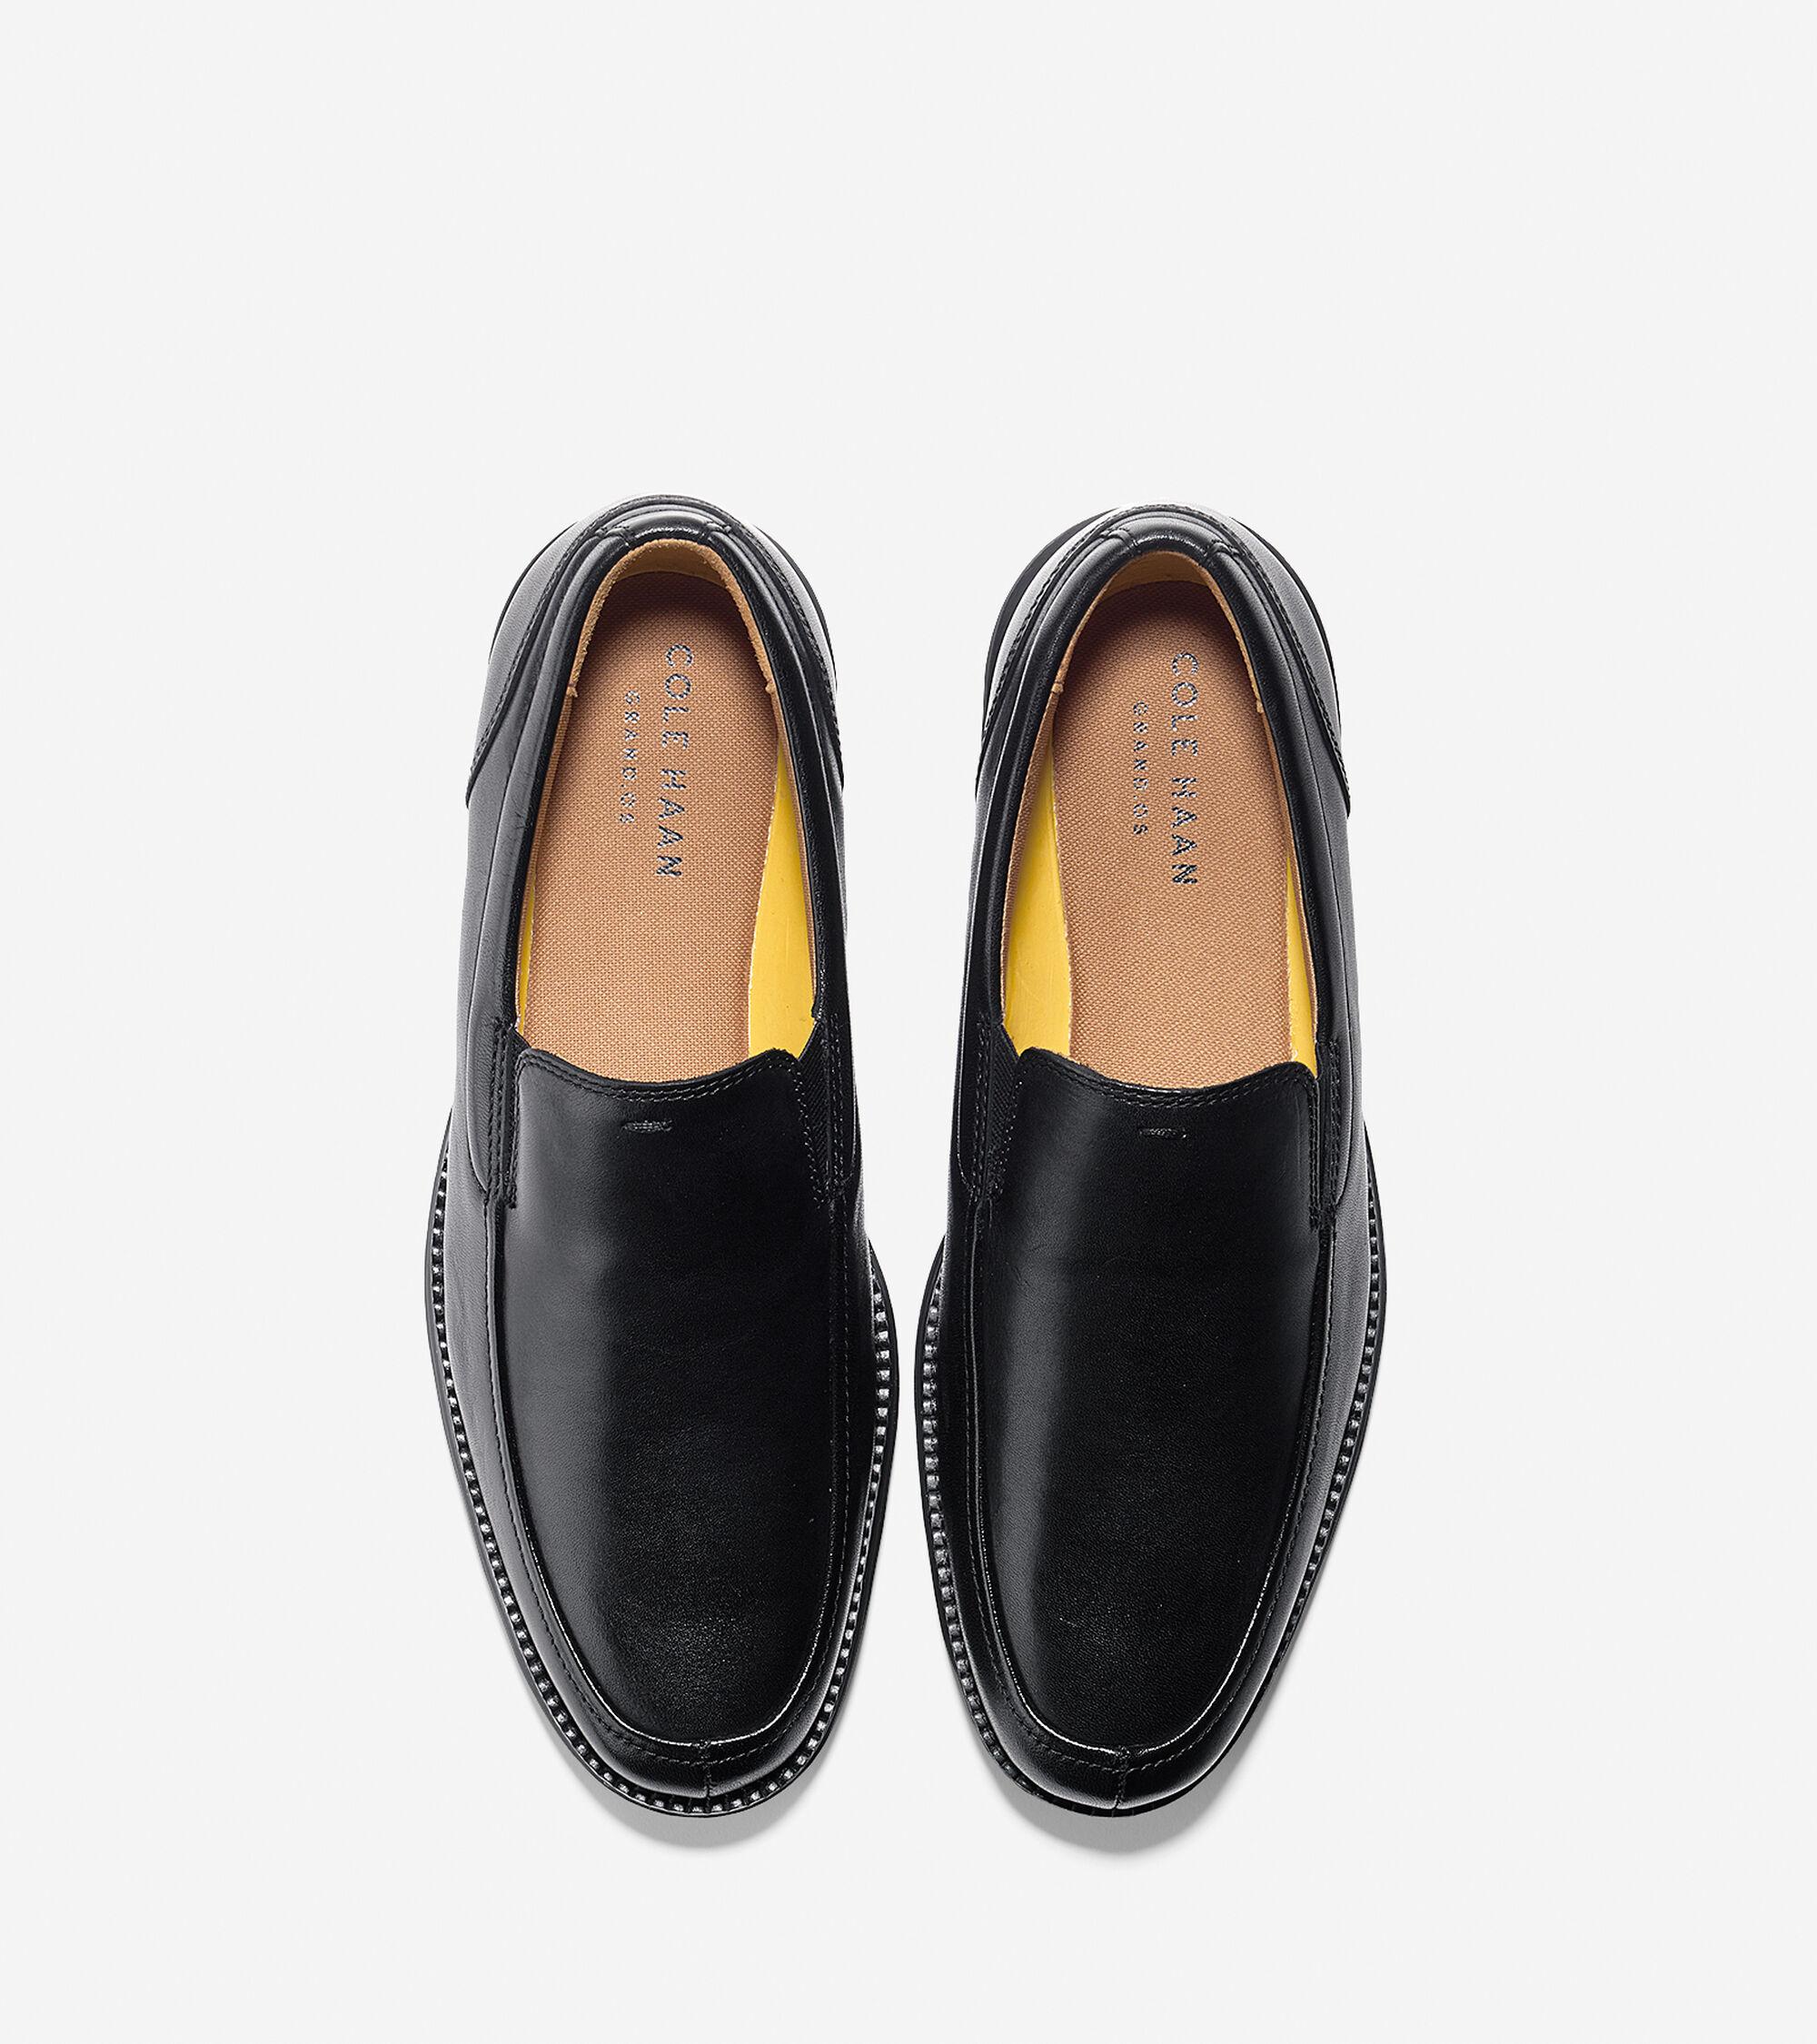 720ef708ad8 Men s OriginalGrand Venetian Loafers in Black